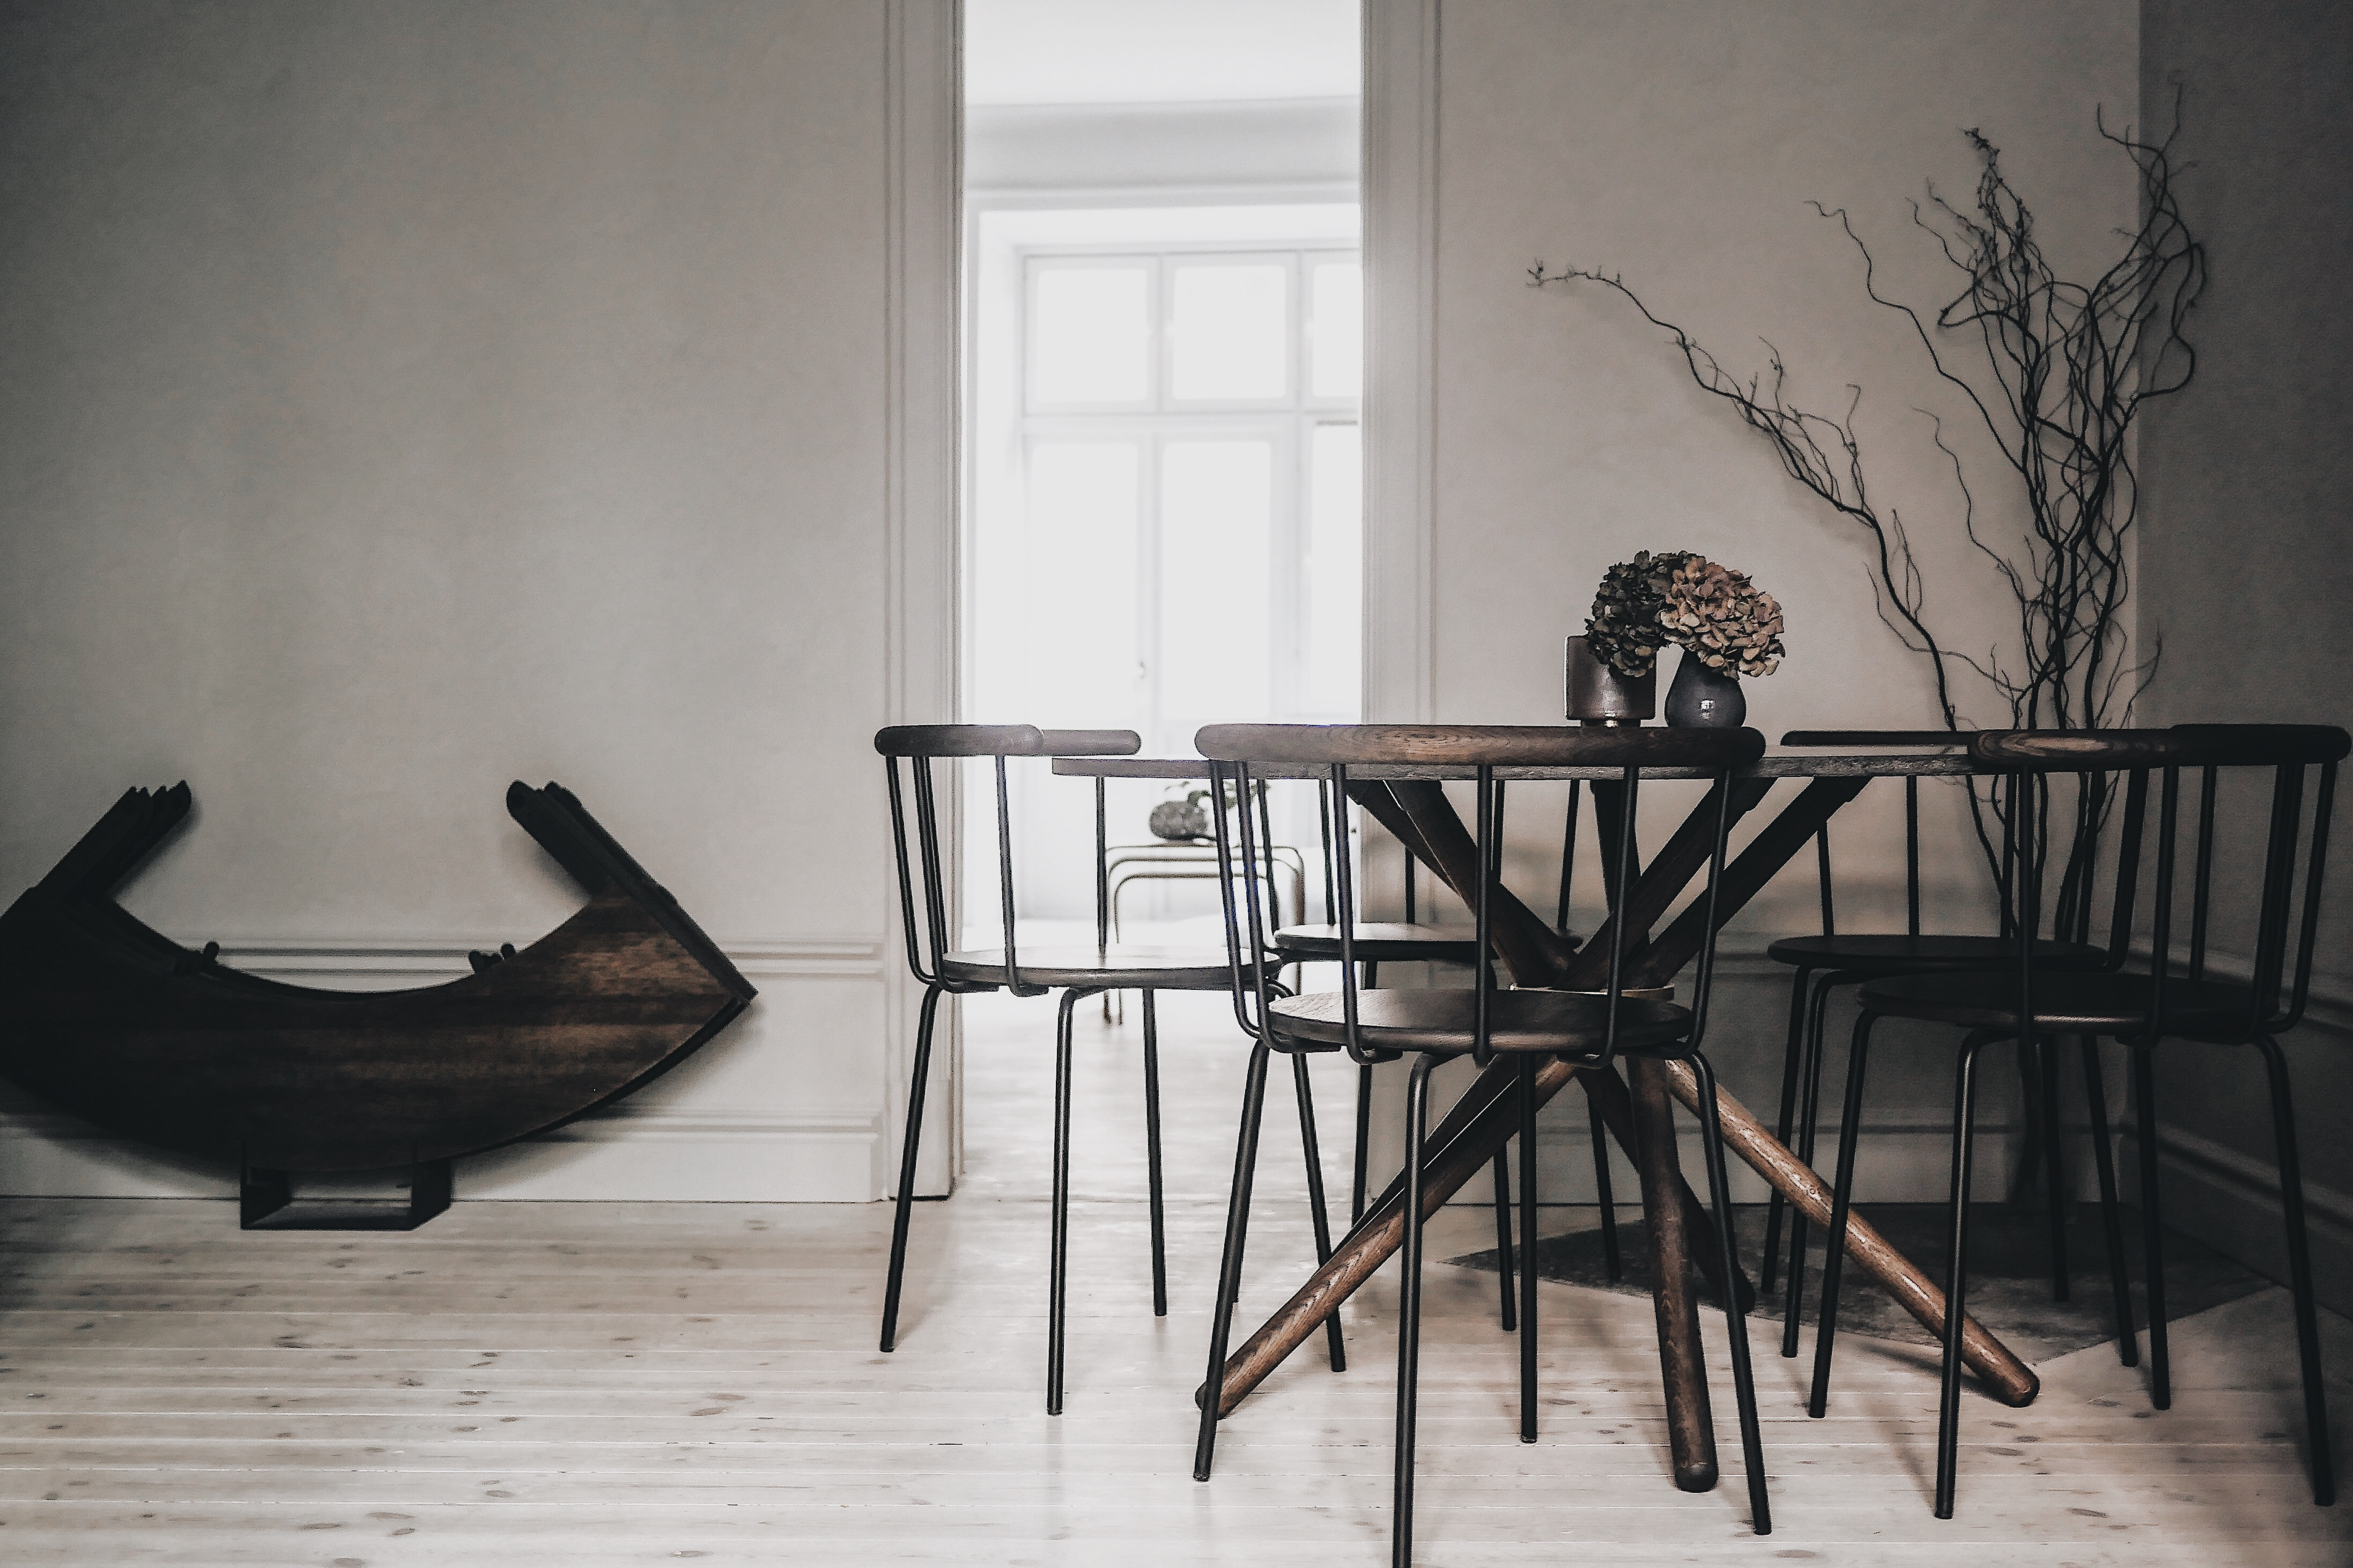 Hela köket i bilder Evelina Andersson Metro Mode